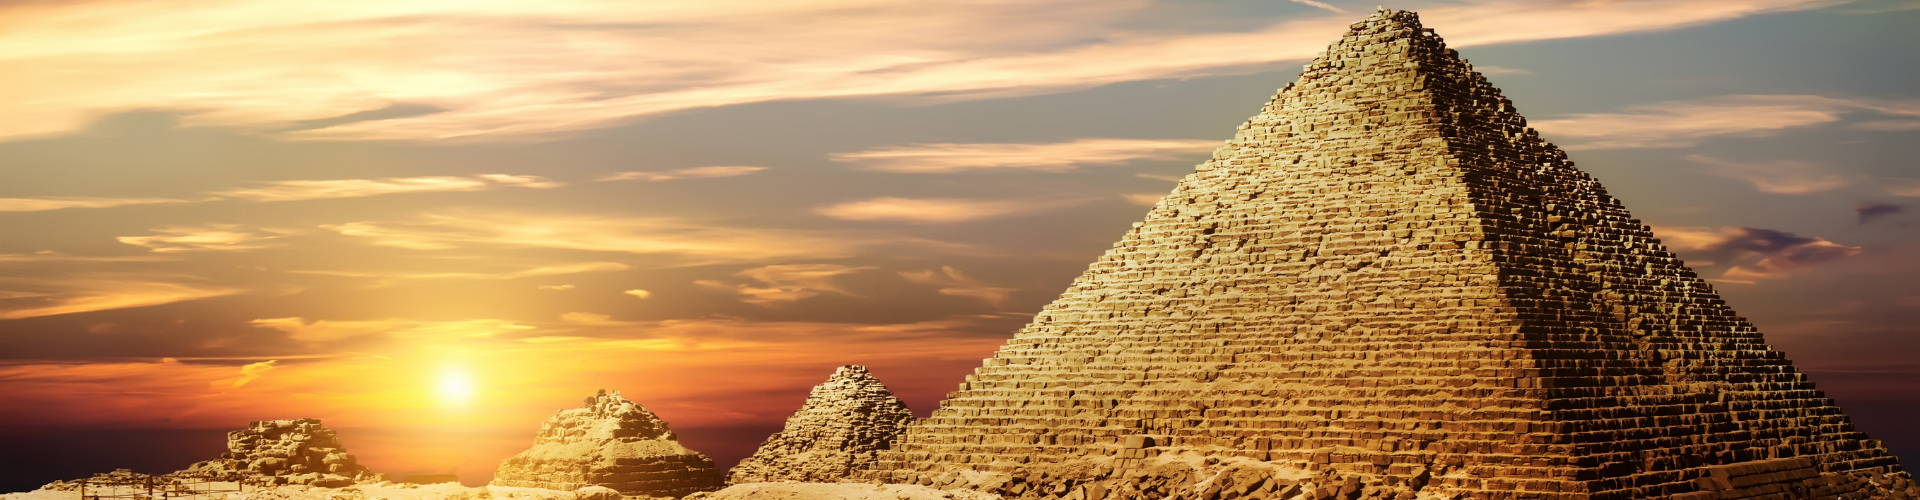 egypt incense history